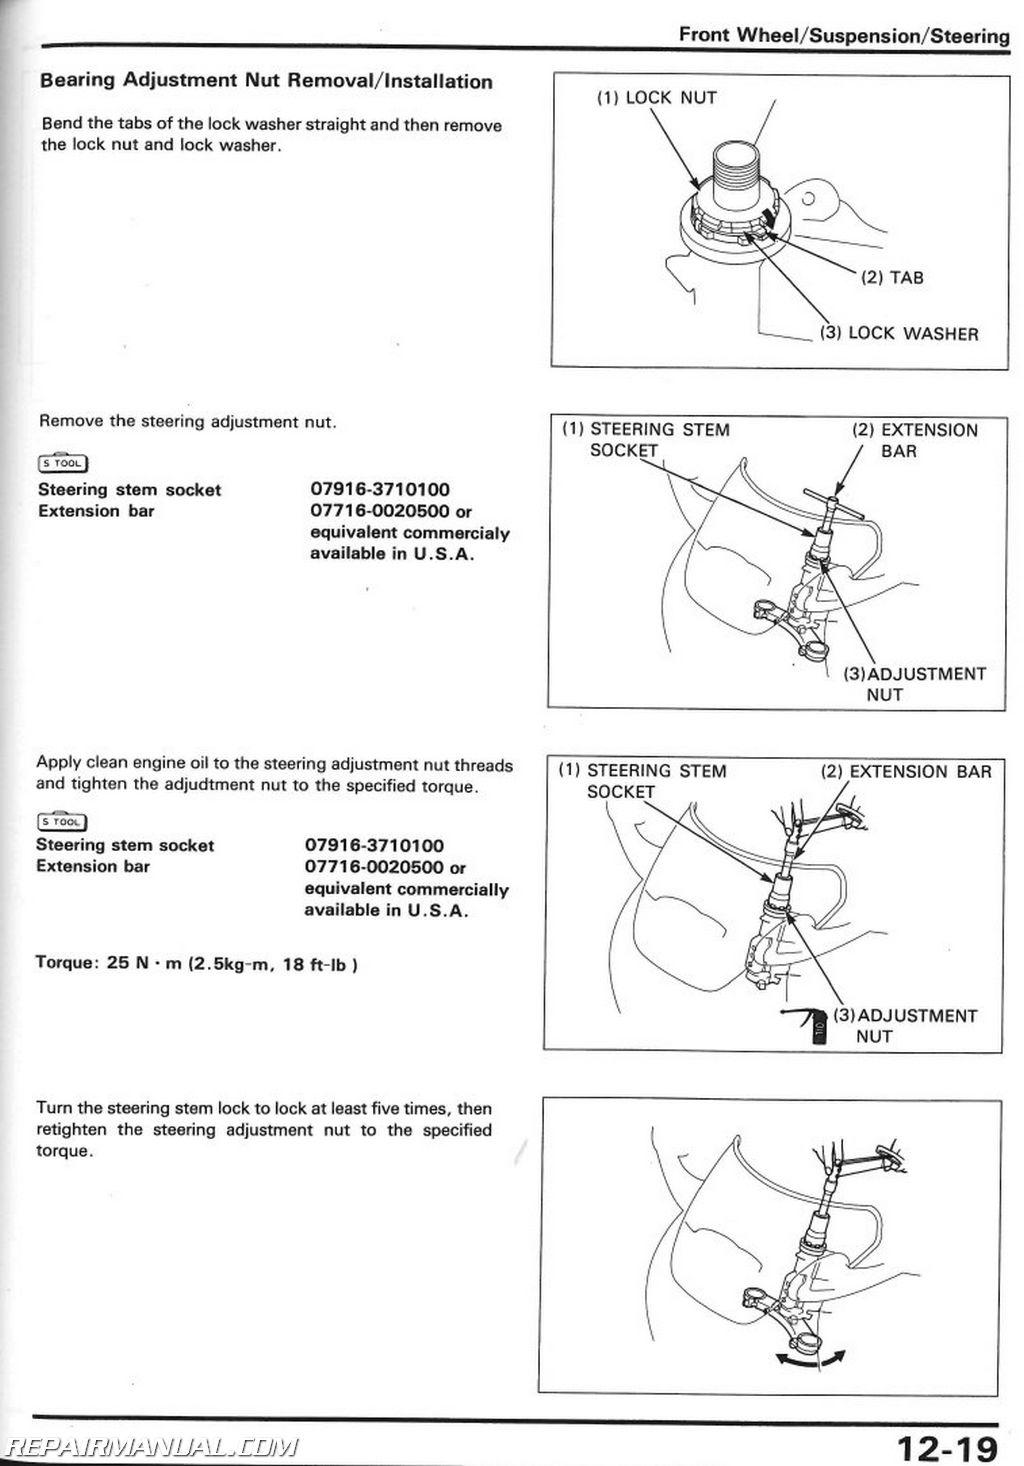 1991 honda civic ignition switch wiring diagram pathophysiology of liver cirrhosis in form 1994 cbr600f2 service manual 61mv903 ebay